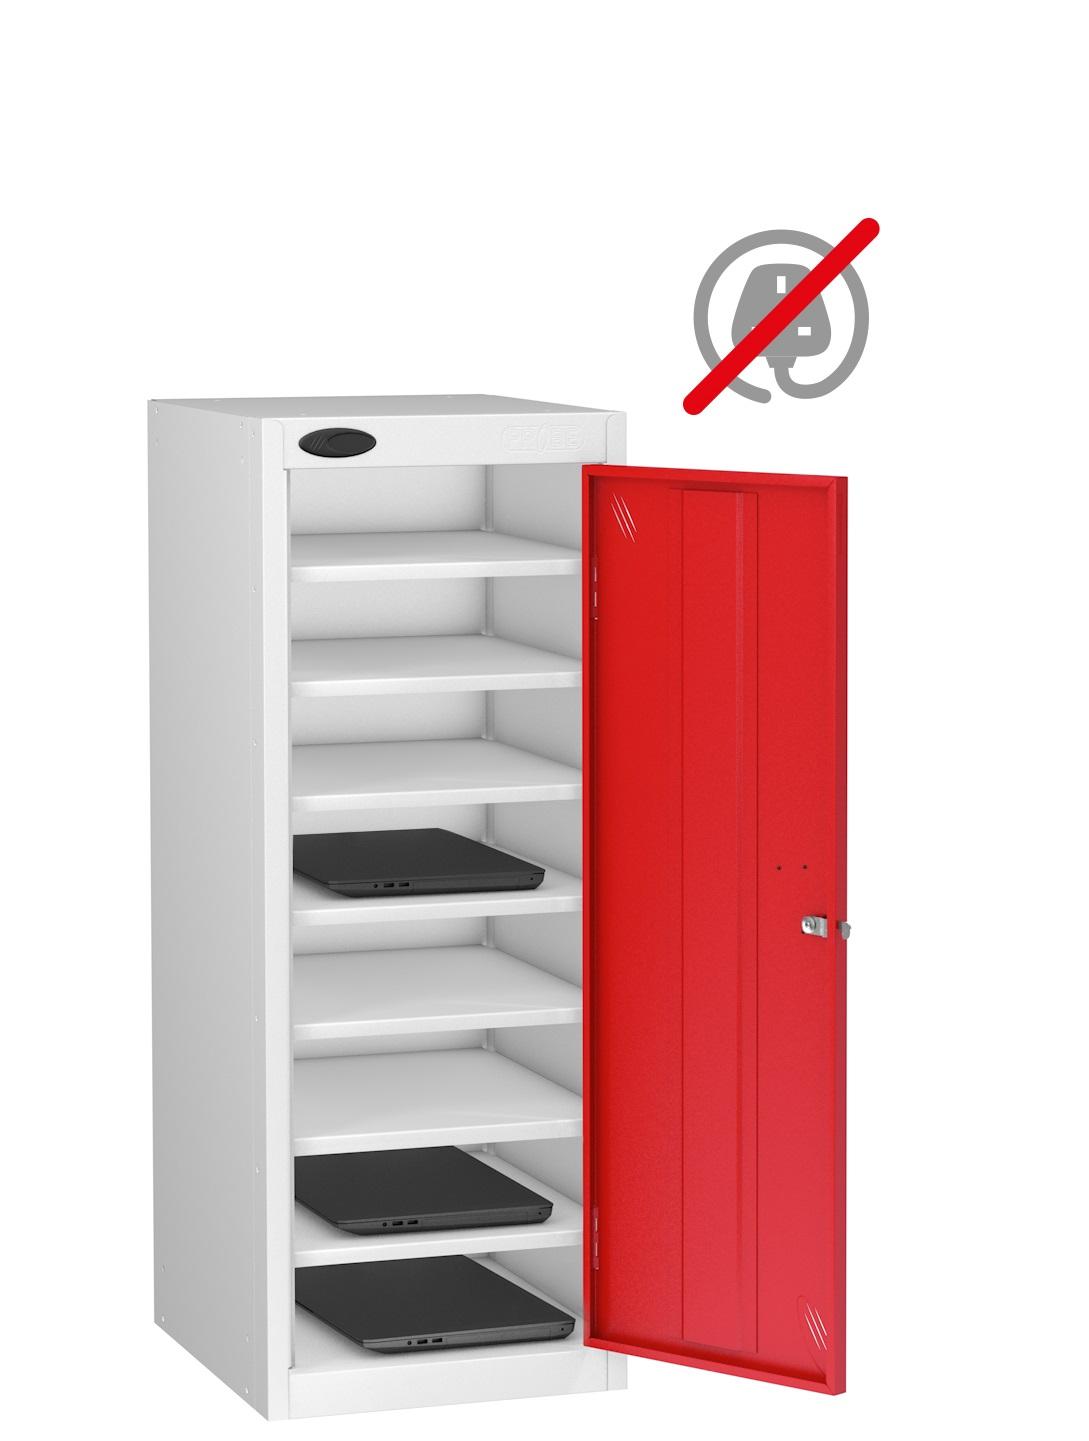 LOW Laptop Locker Sgle Dr 8 Shelf - Non Charge